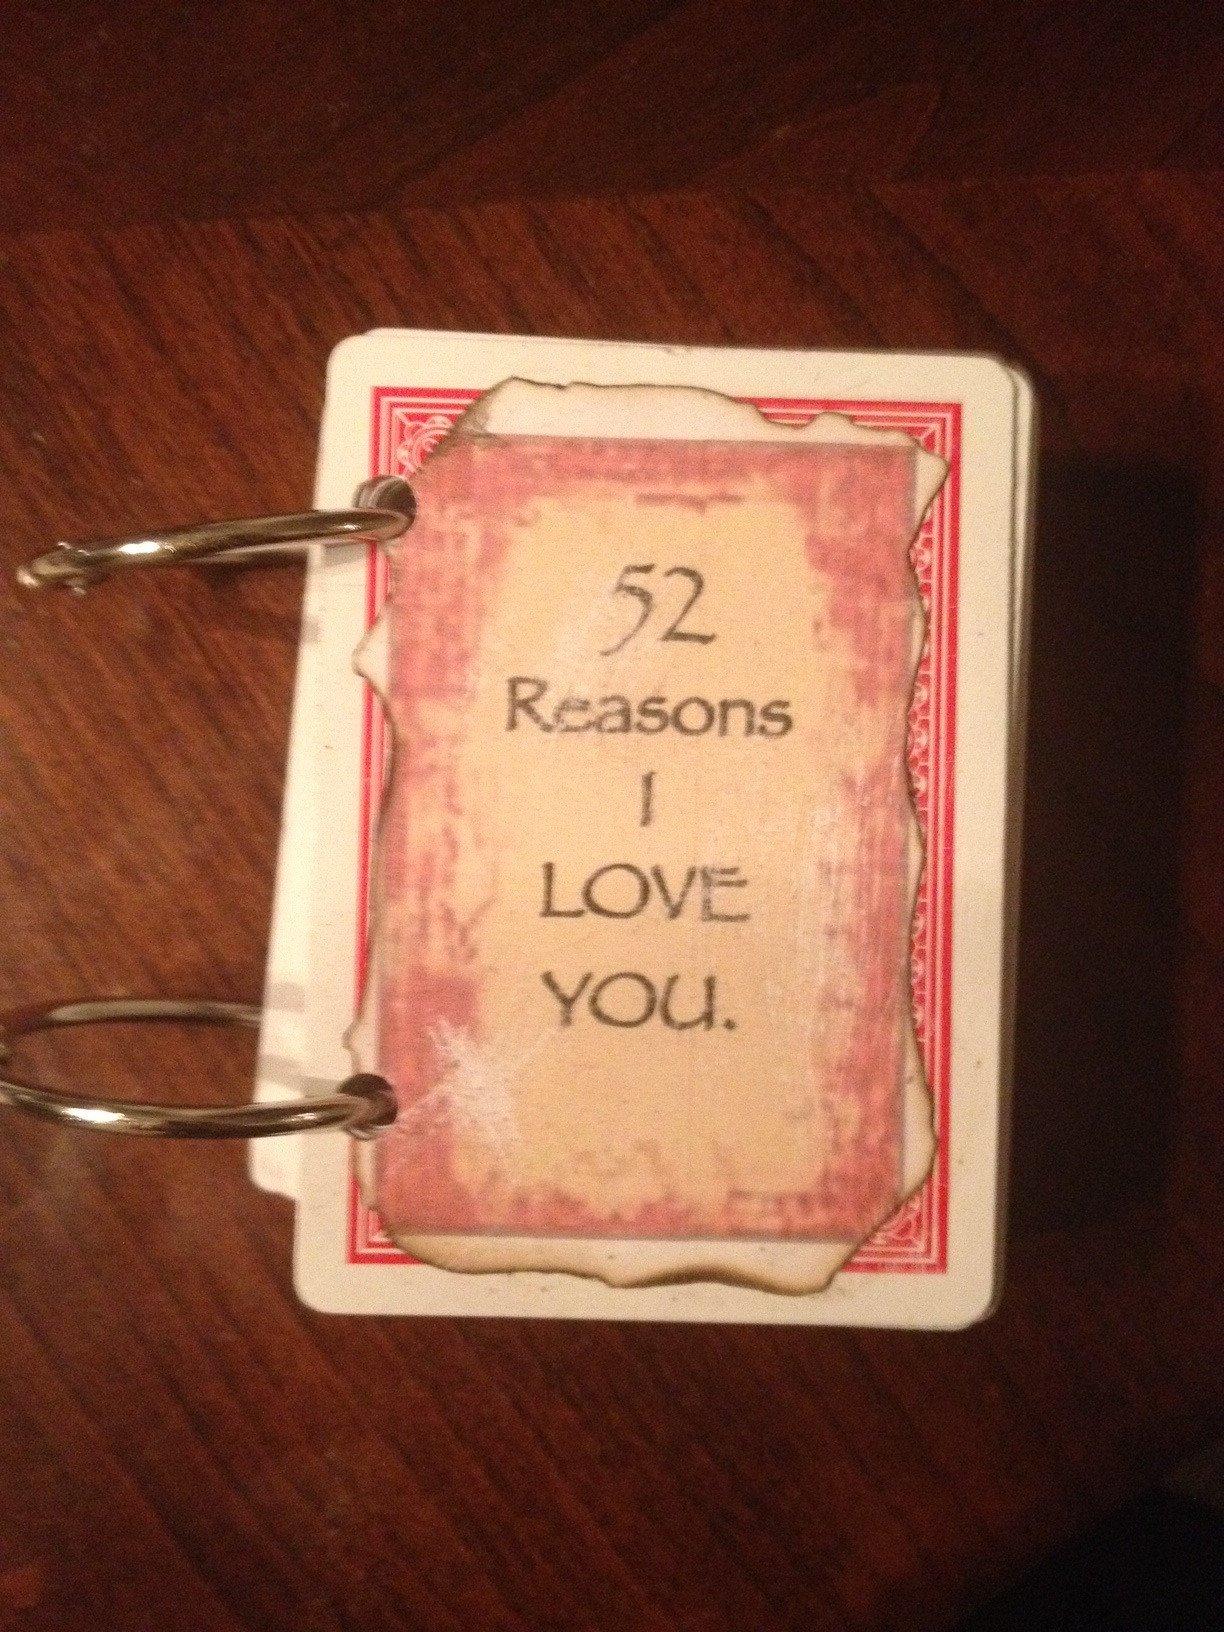 Reasons I Love You Template 52 Reasons I Love You